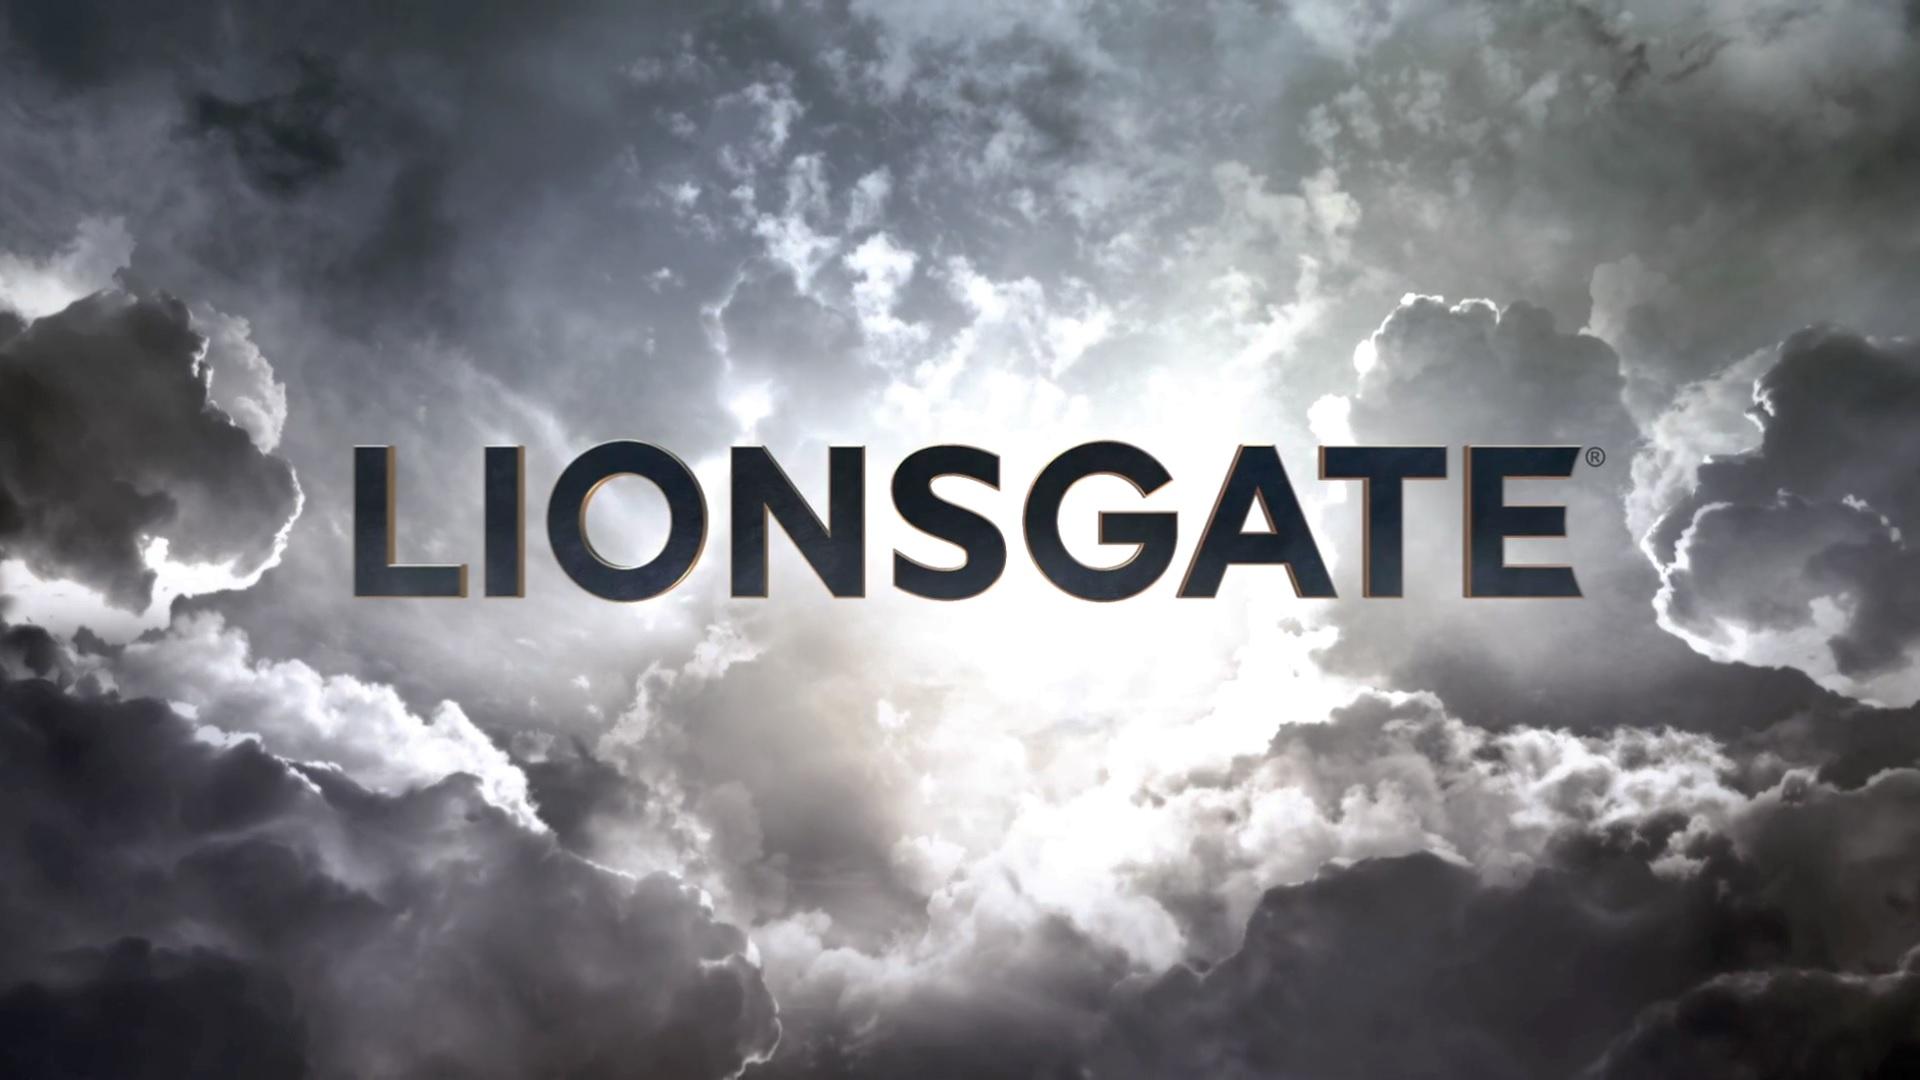 movie studio logos lionsgate